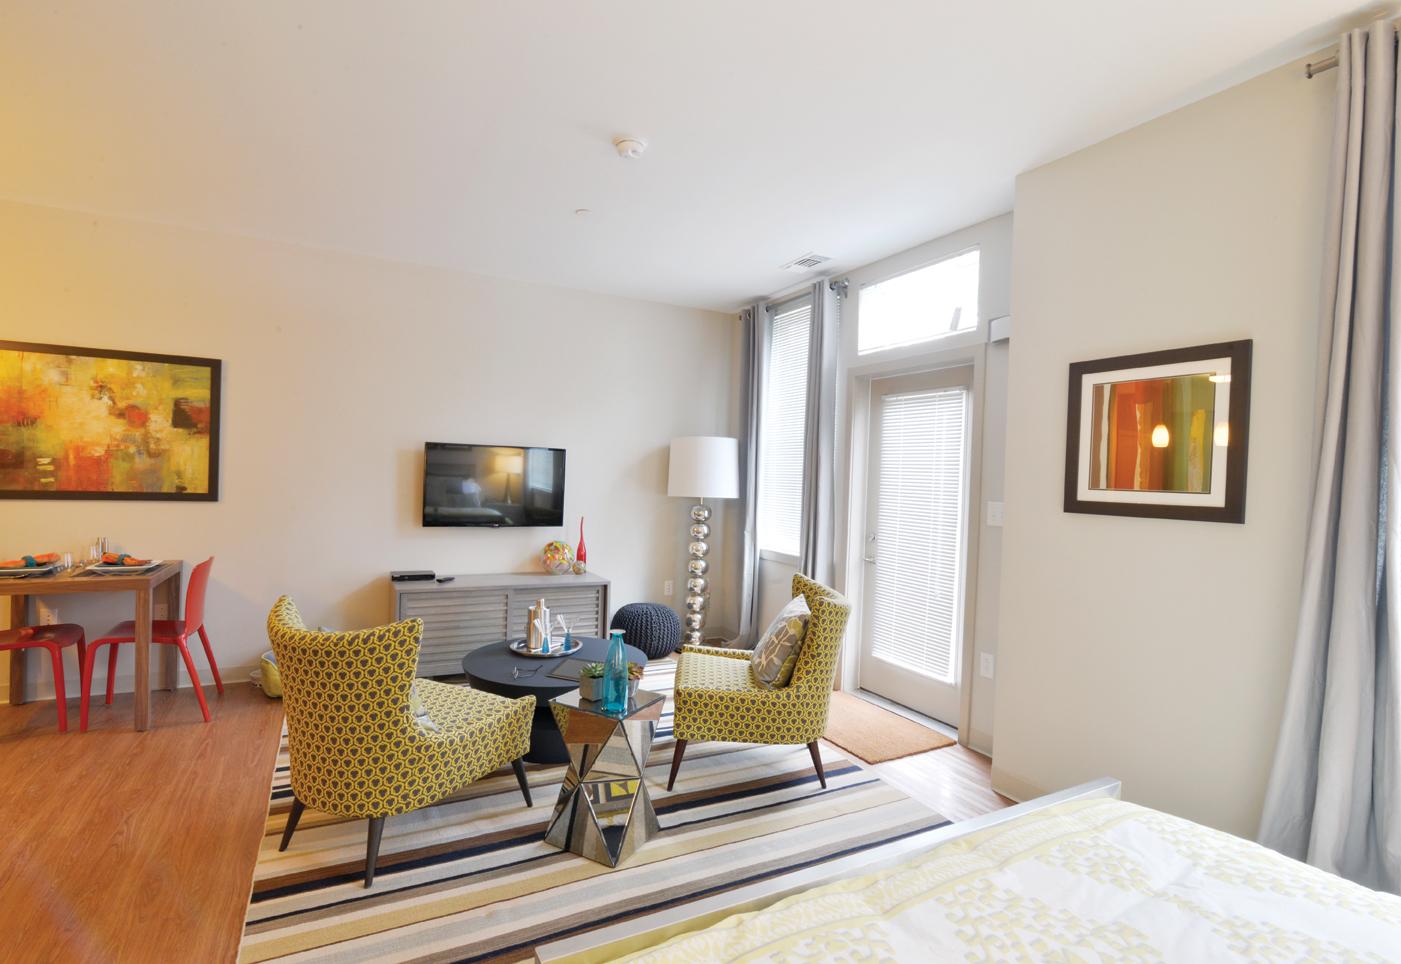 A modern apartment unit